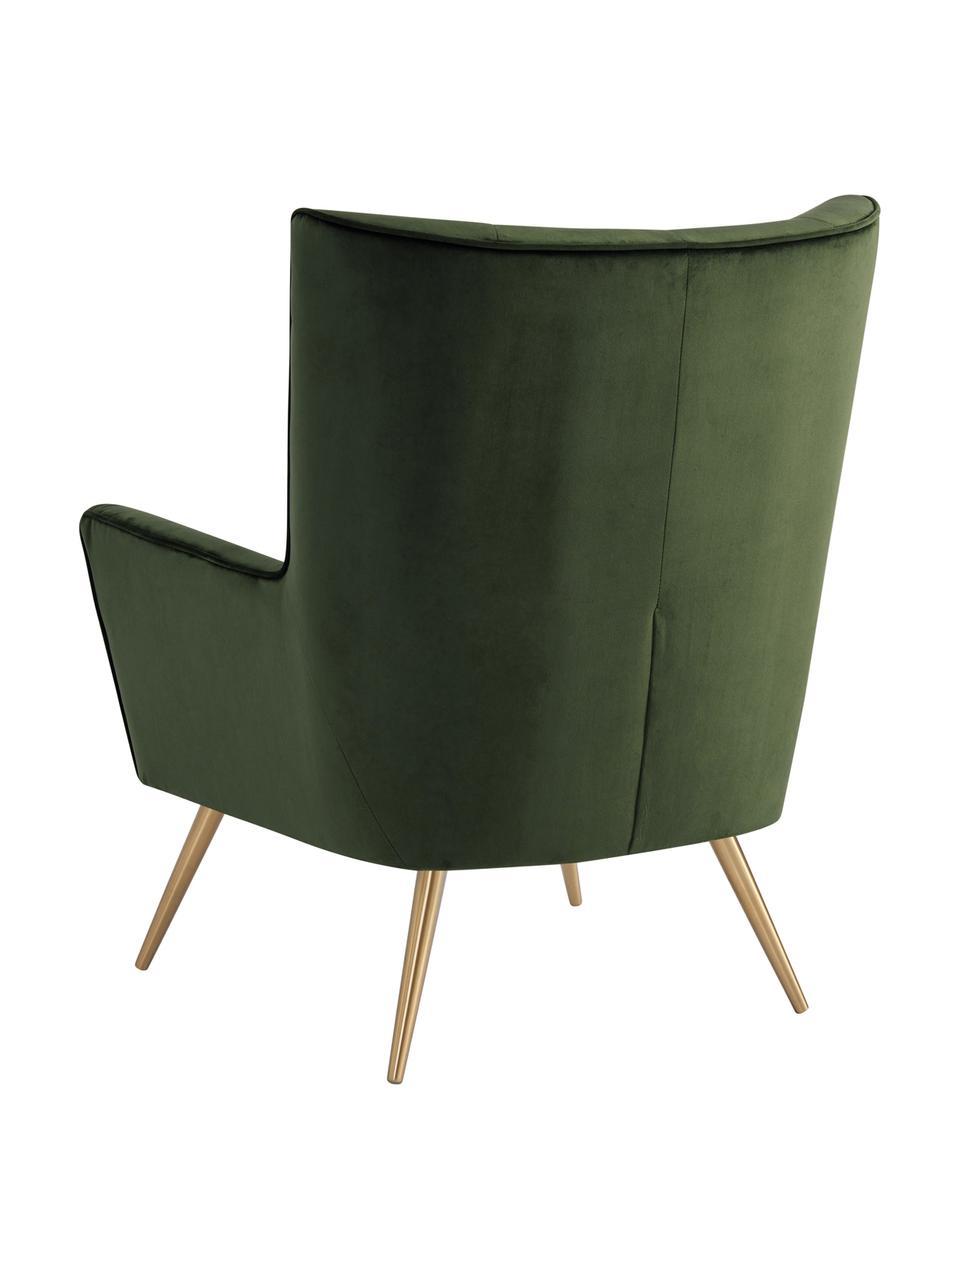 Samt-Ohrensessel Bodiva in Grün, Bezug: Polyester (Samt), Füße: Metall, lackiert, Waldgrün, Messingfarben, B 82 x T 88 cm